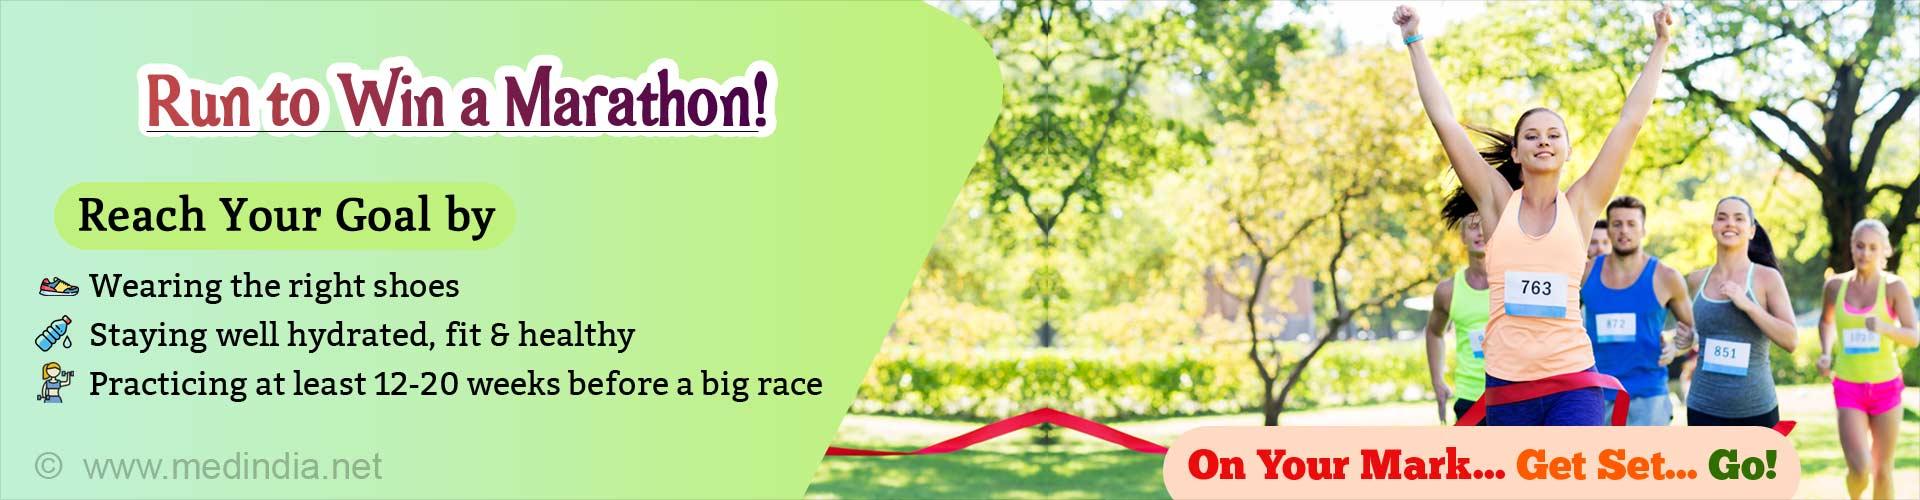 Run to Win: Simple Tips to Run a Marathon